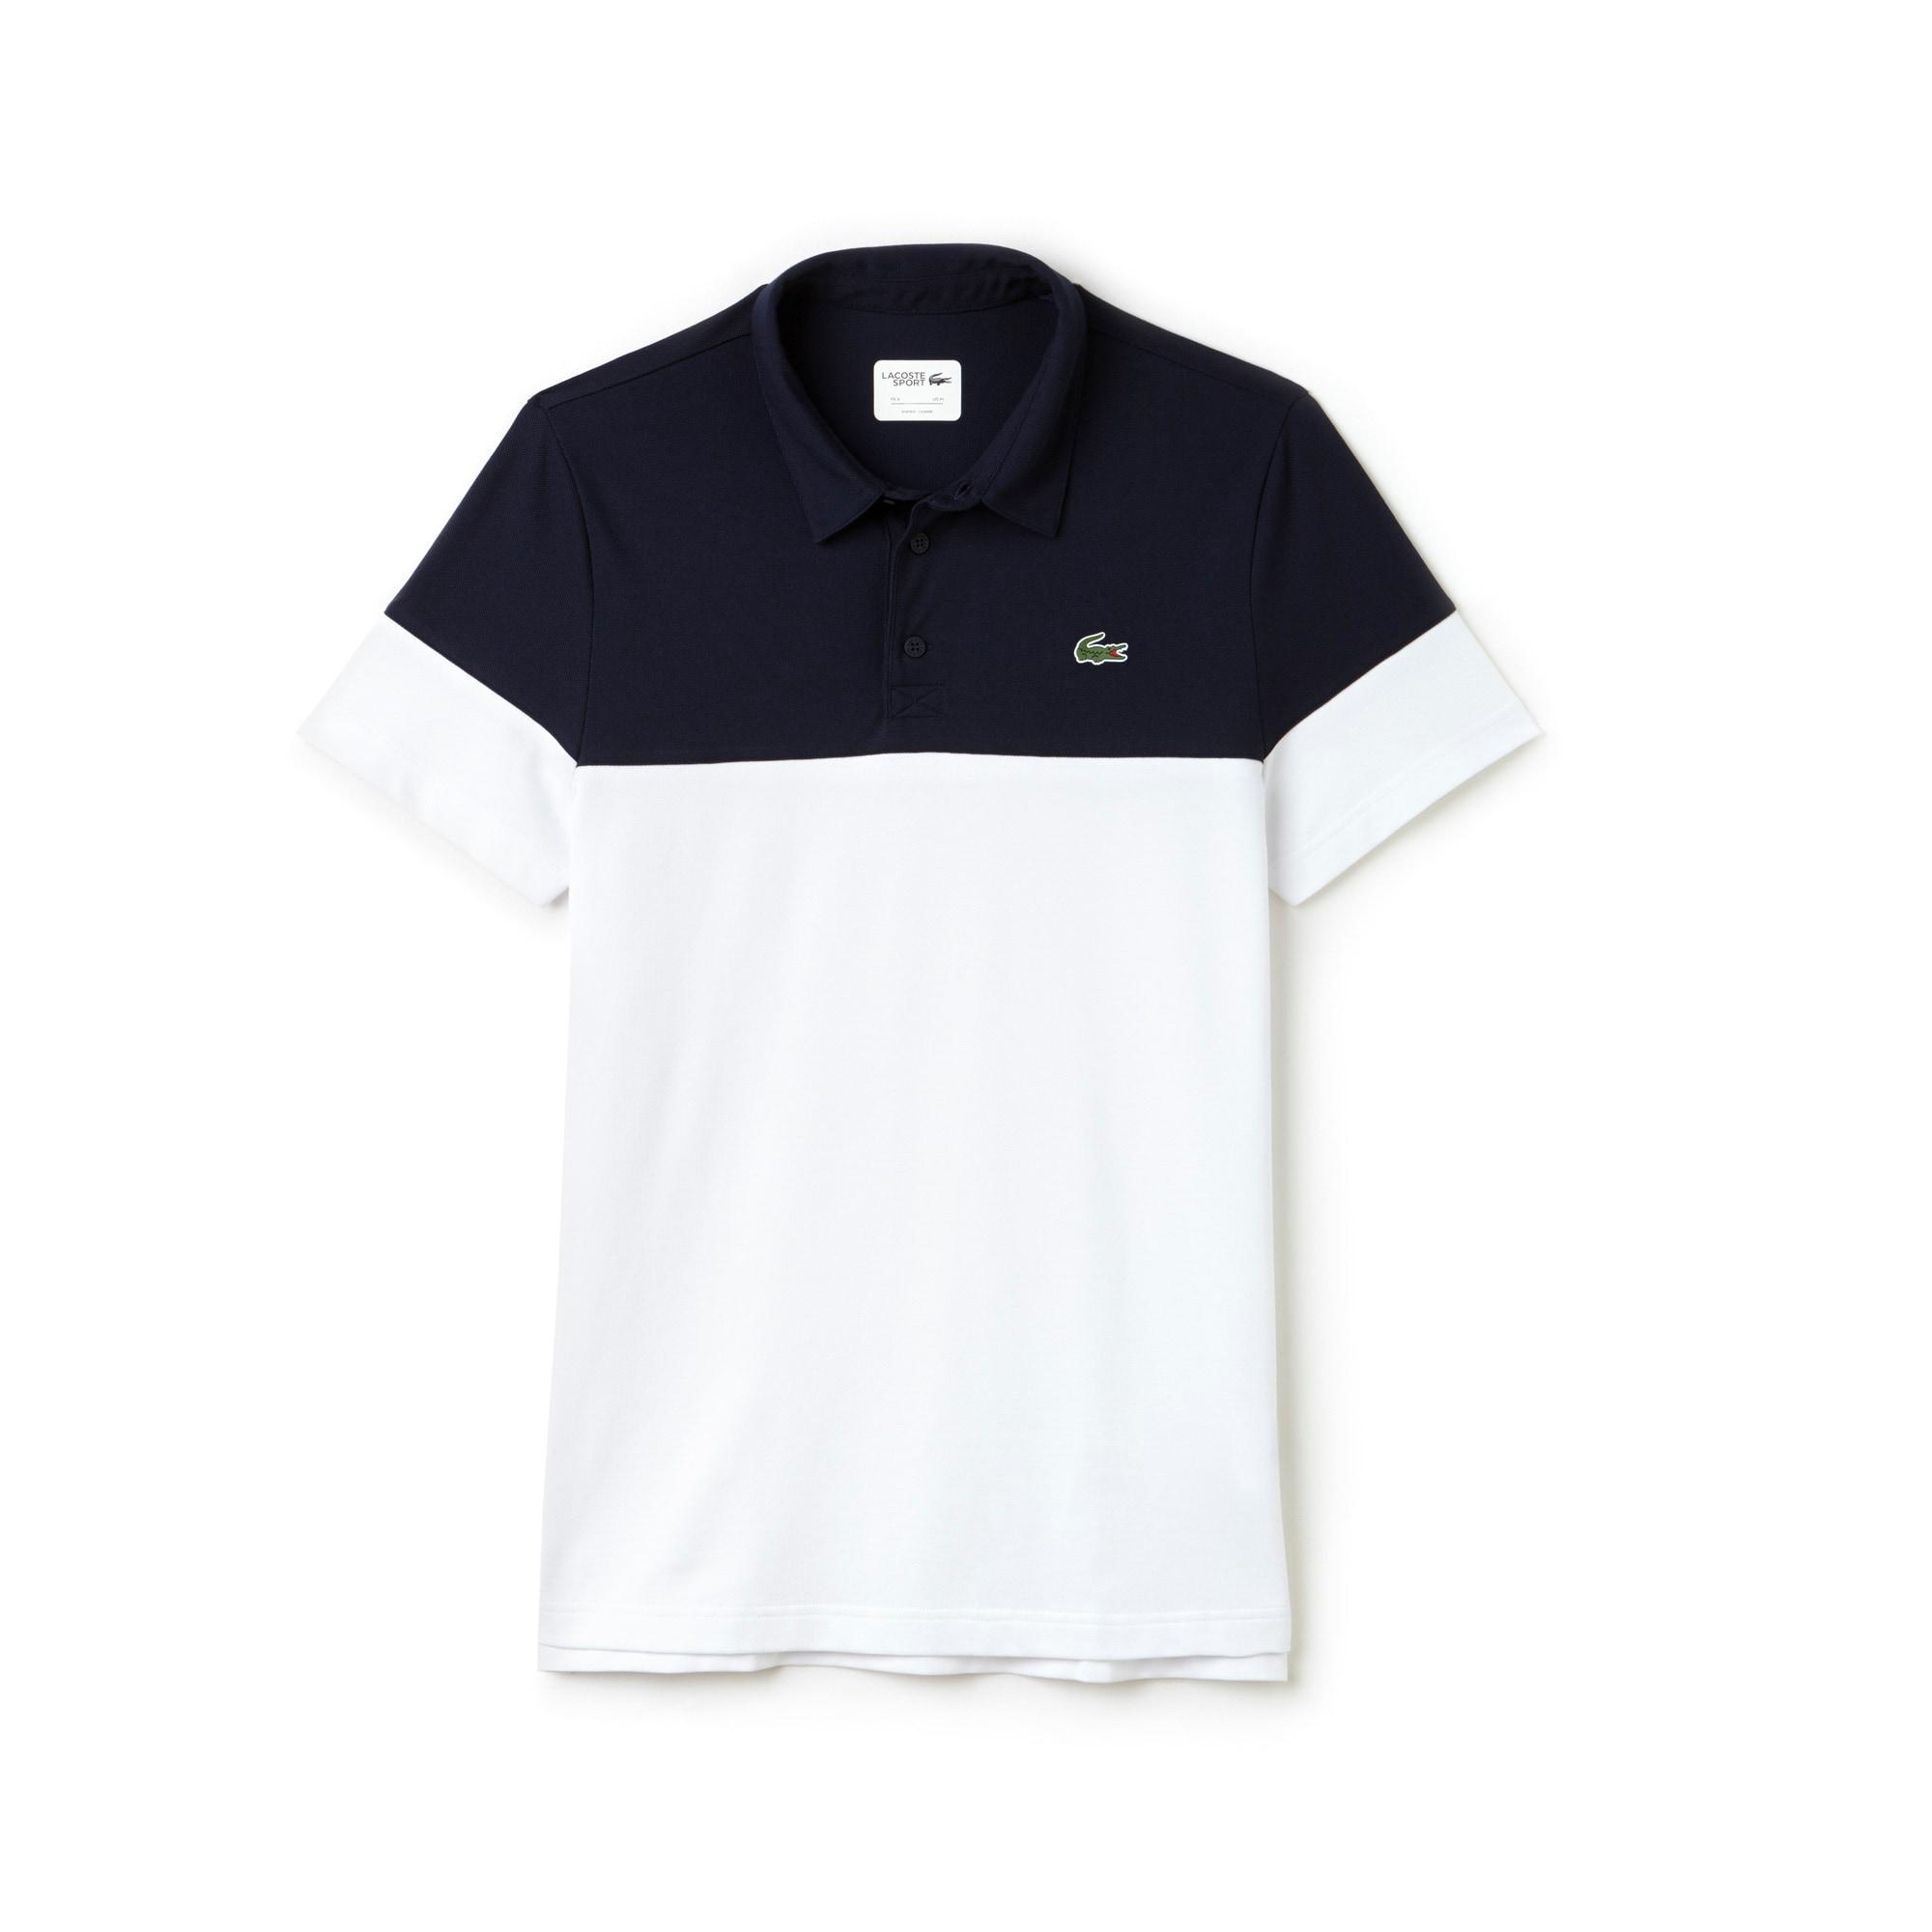 Herren-Poloshirt aus Funktionspiqué LACOSTE SPORT GOLF